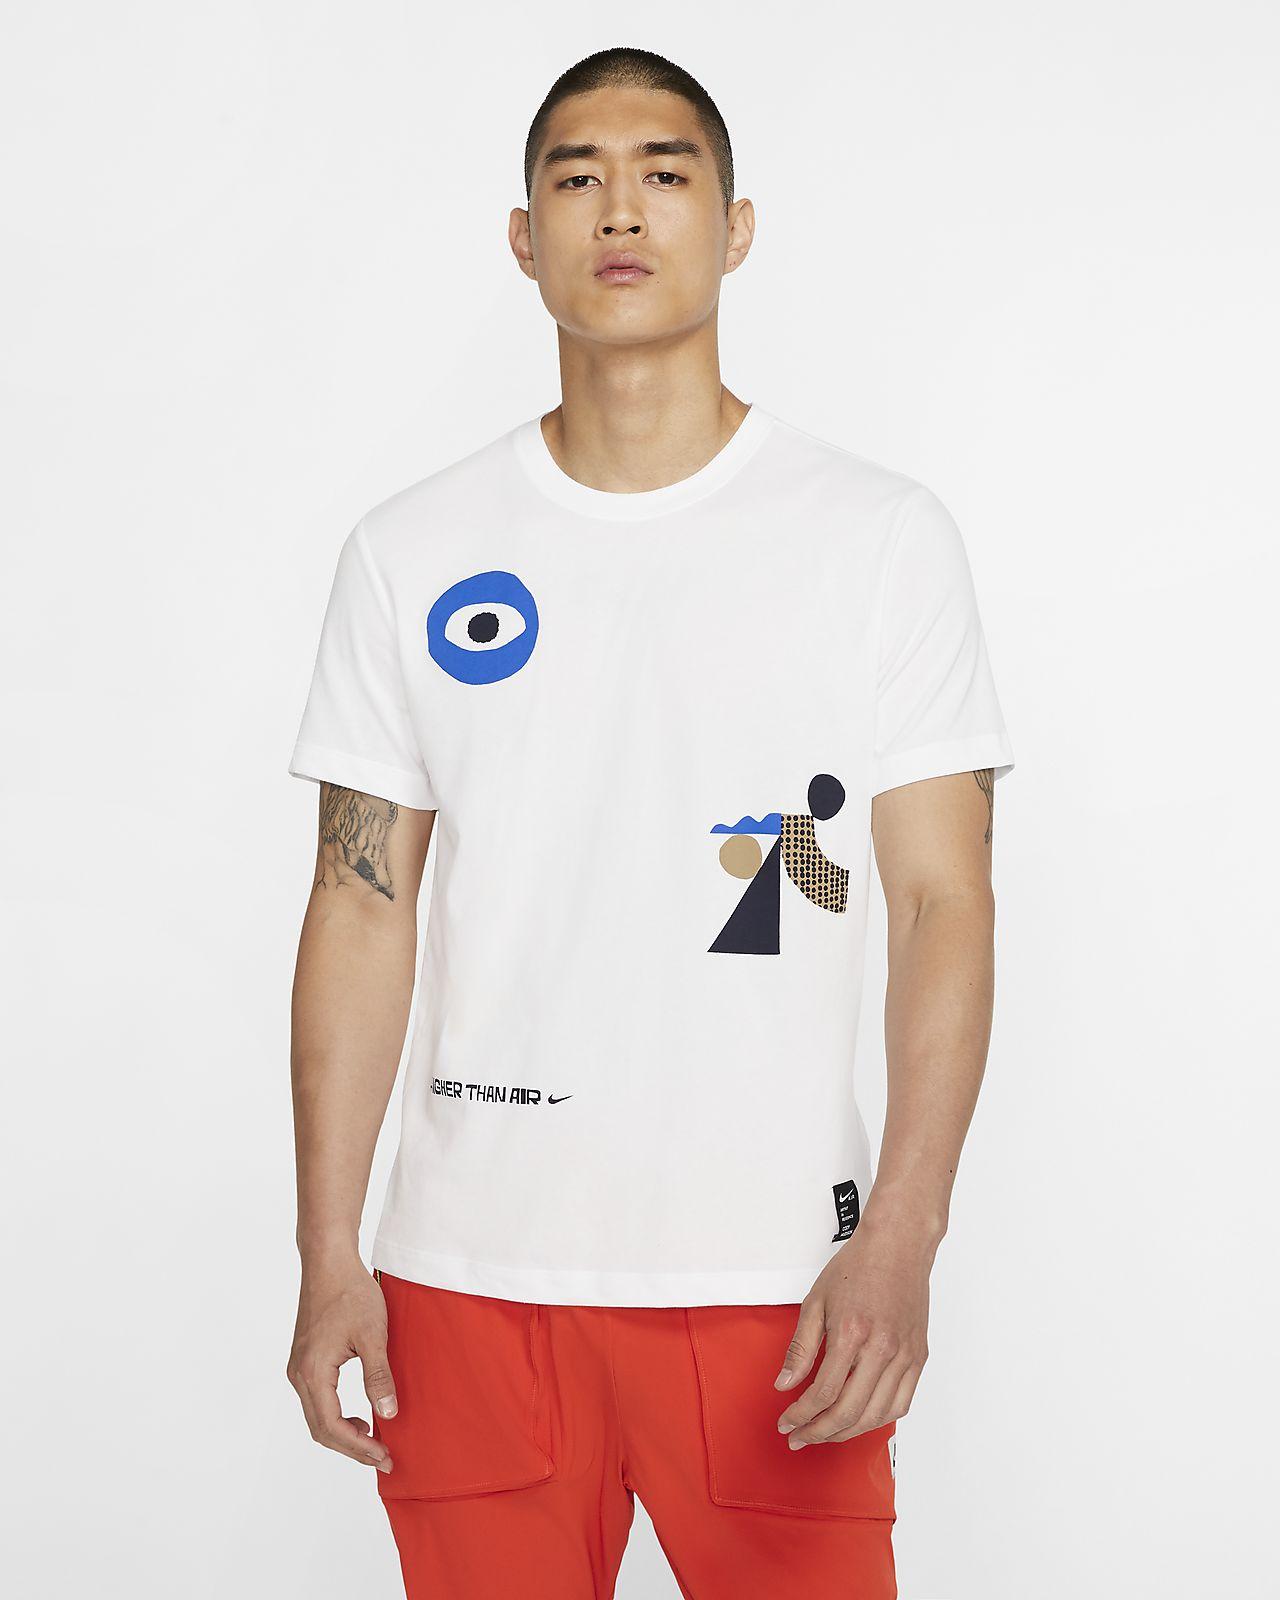 Nike Dri-FIT A.I.R. Cody Hudson Men's Running T-Shirt